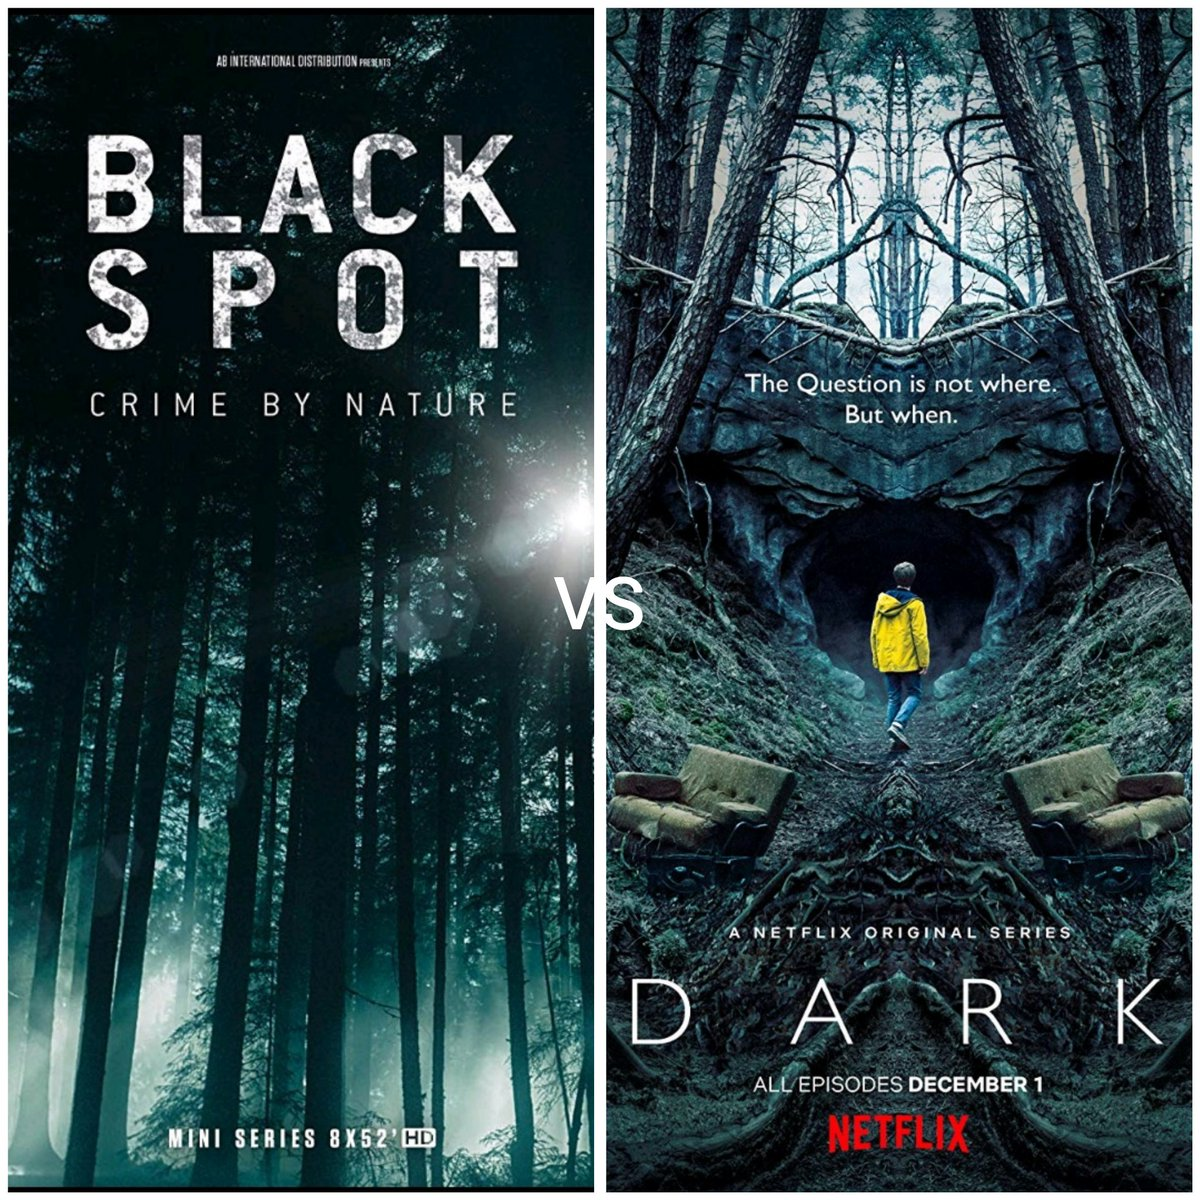 black spot season 2